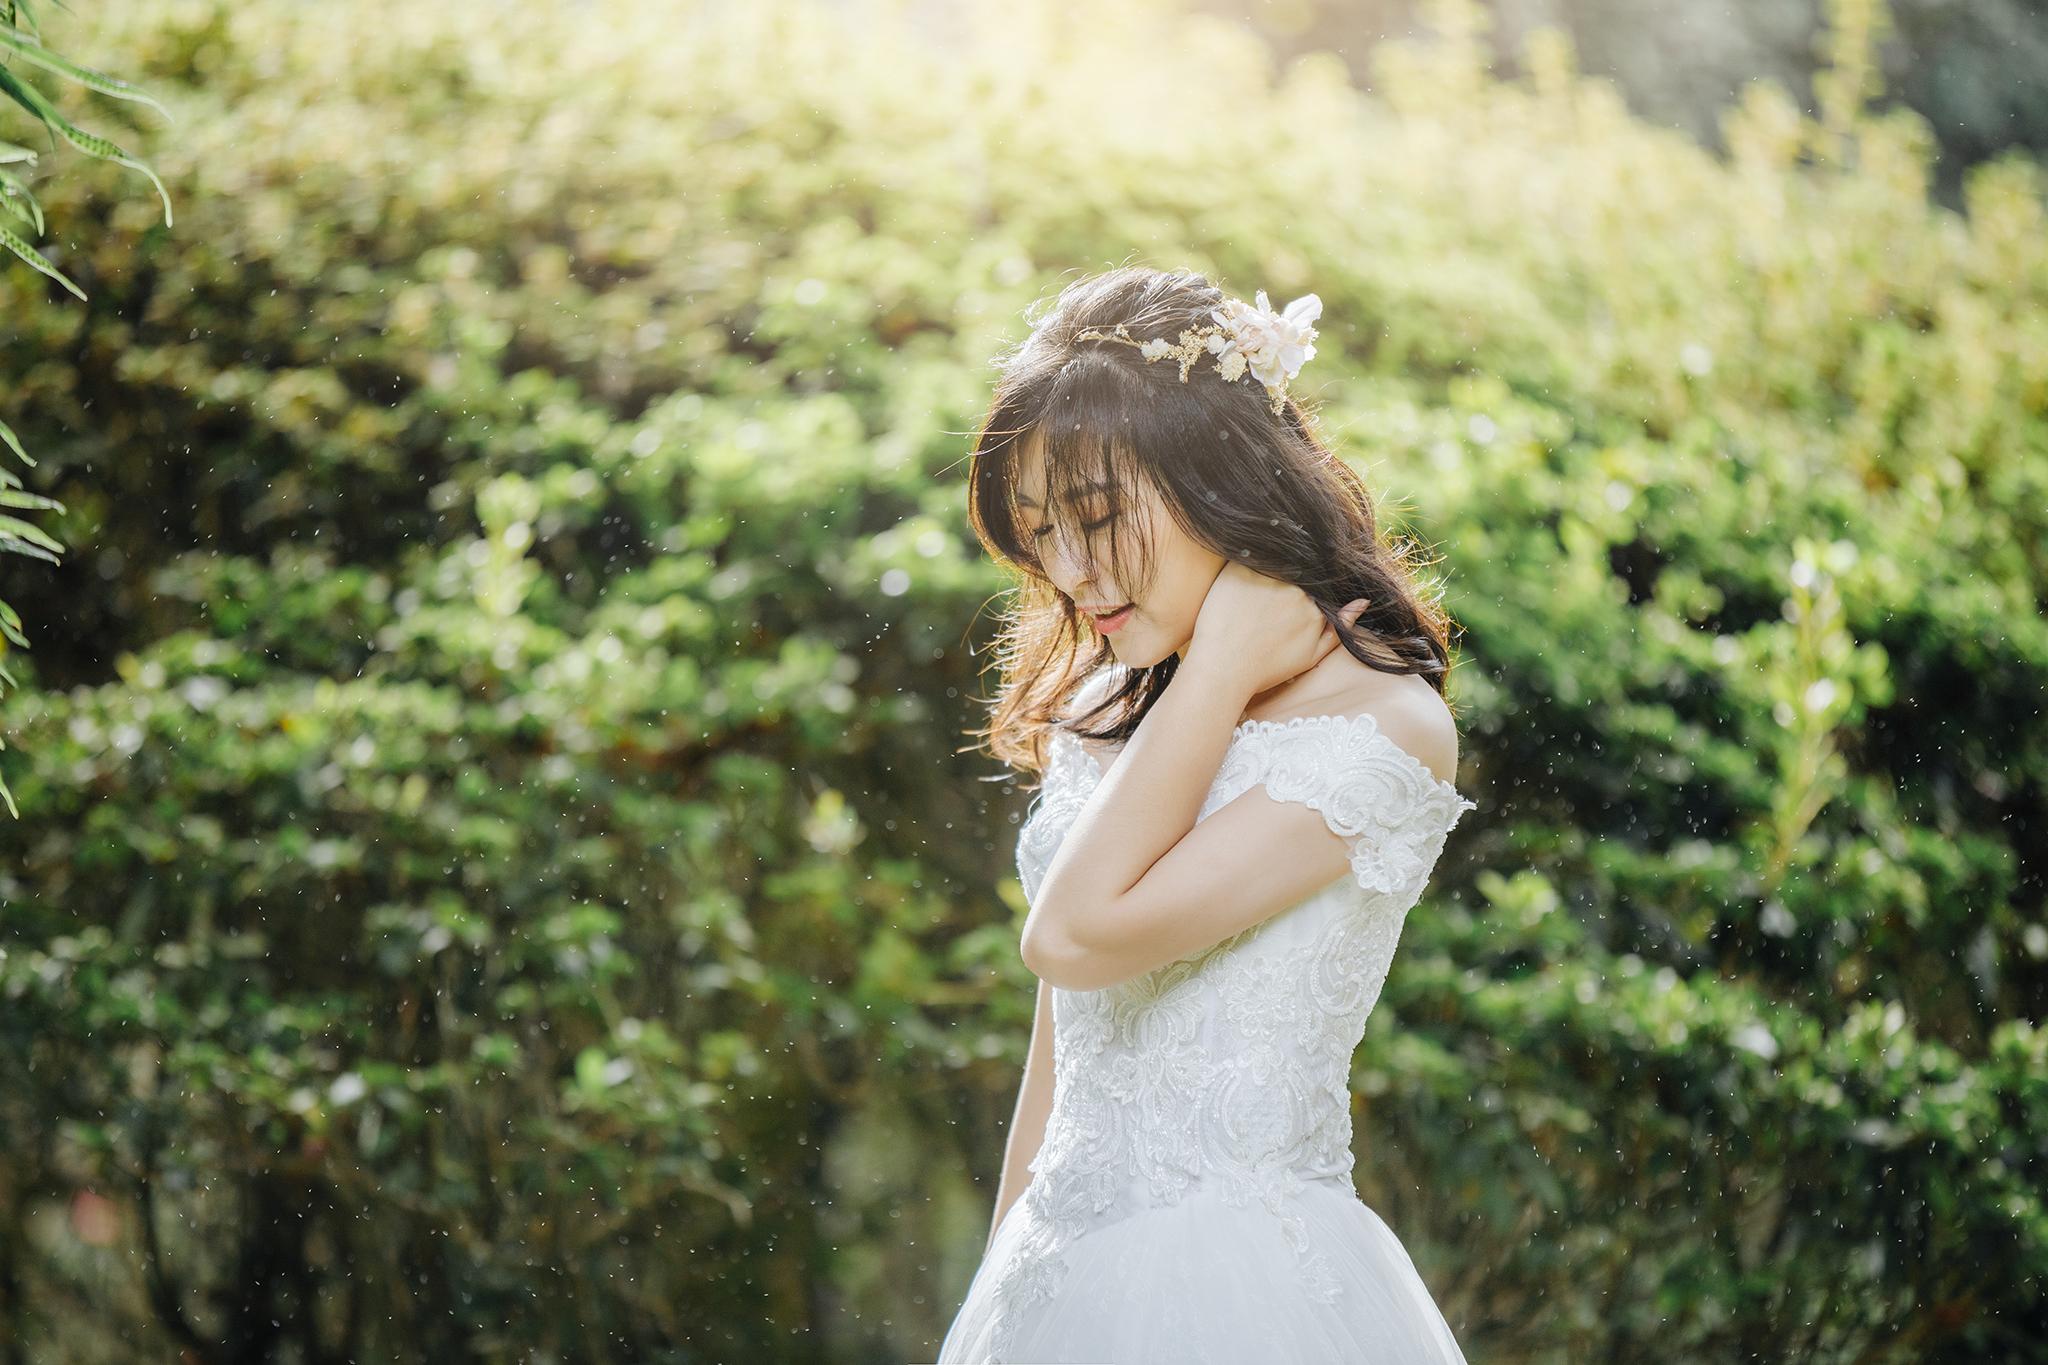 40901355843 e89edffdfc o - 【閨蜜婚紗】+育誠&娟羽&映煦+